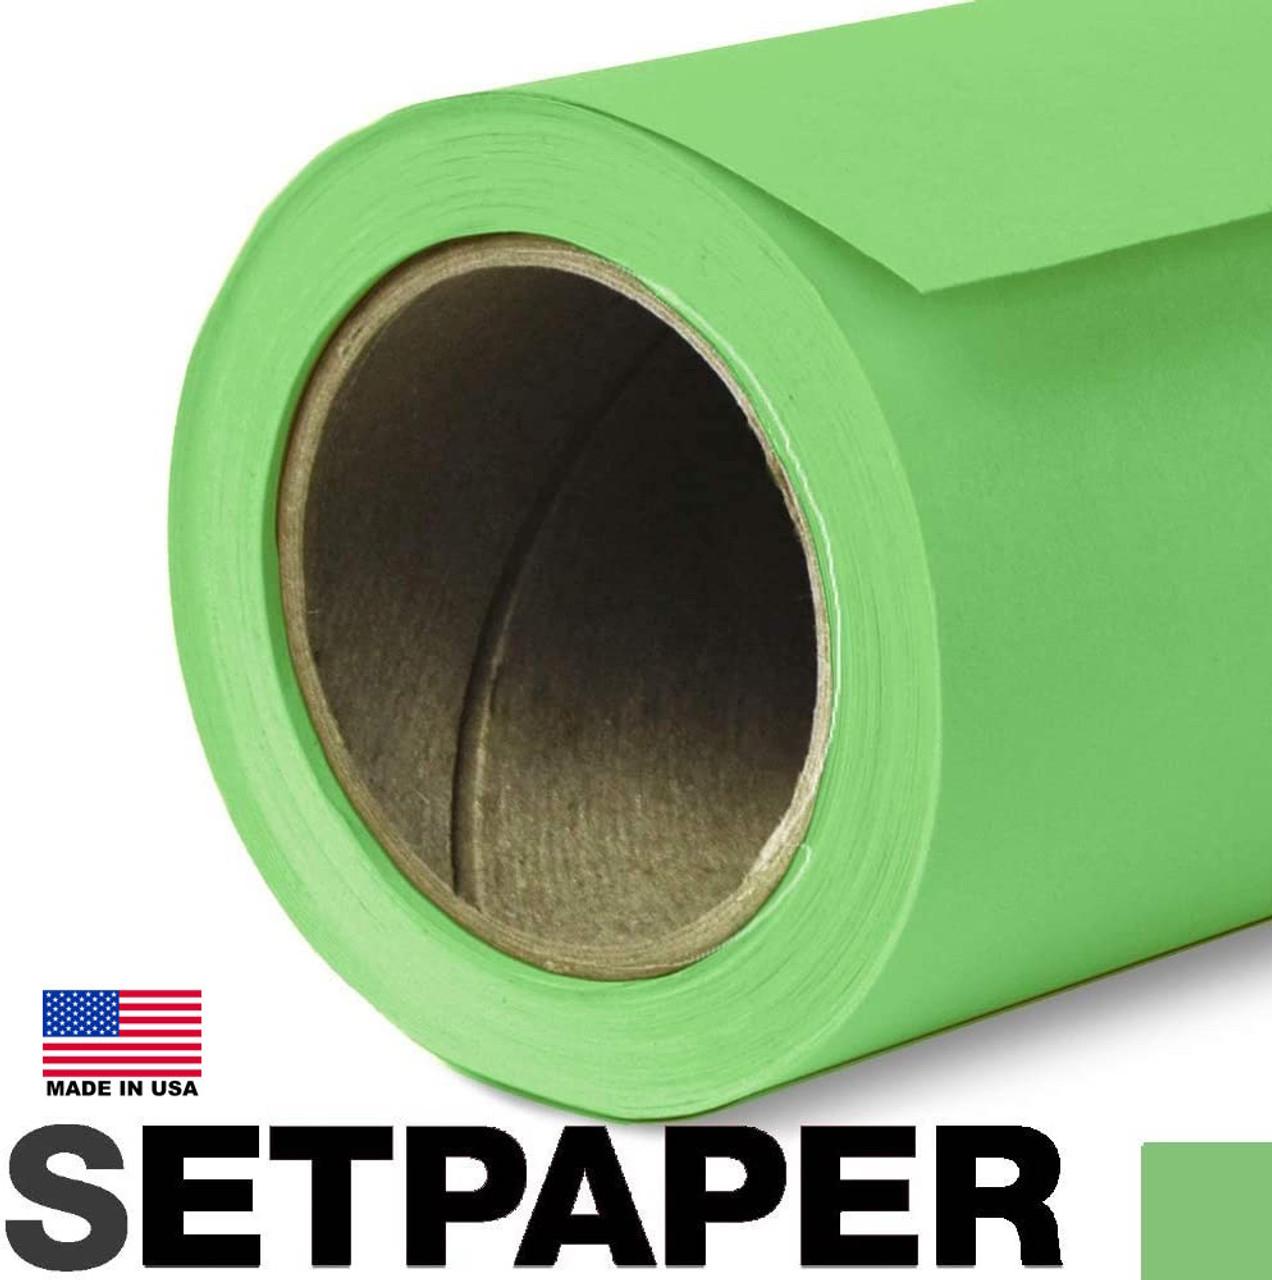 "EXTRA LONG SETPAPER - APPLE GREEN 107"" x 36' (2.7 x 11m)"